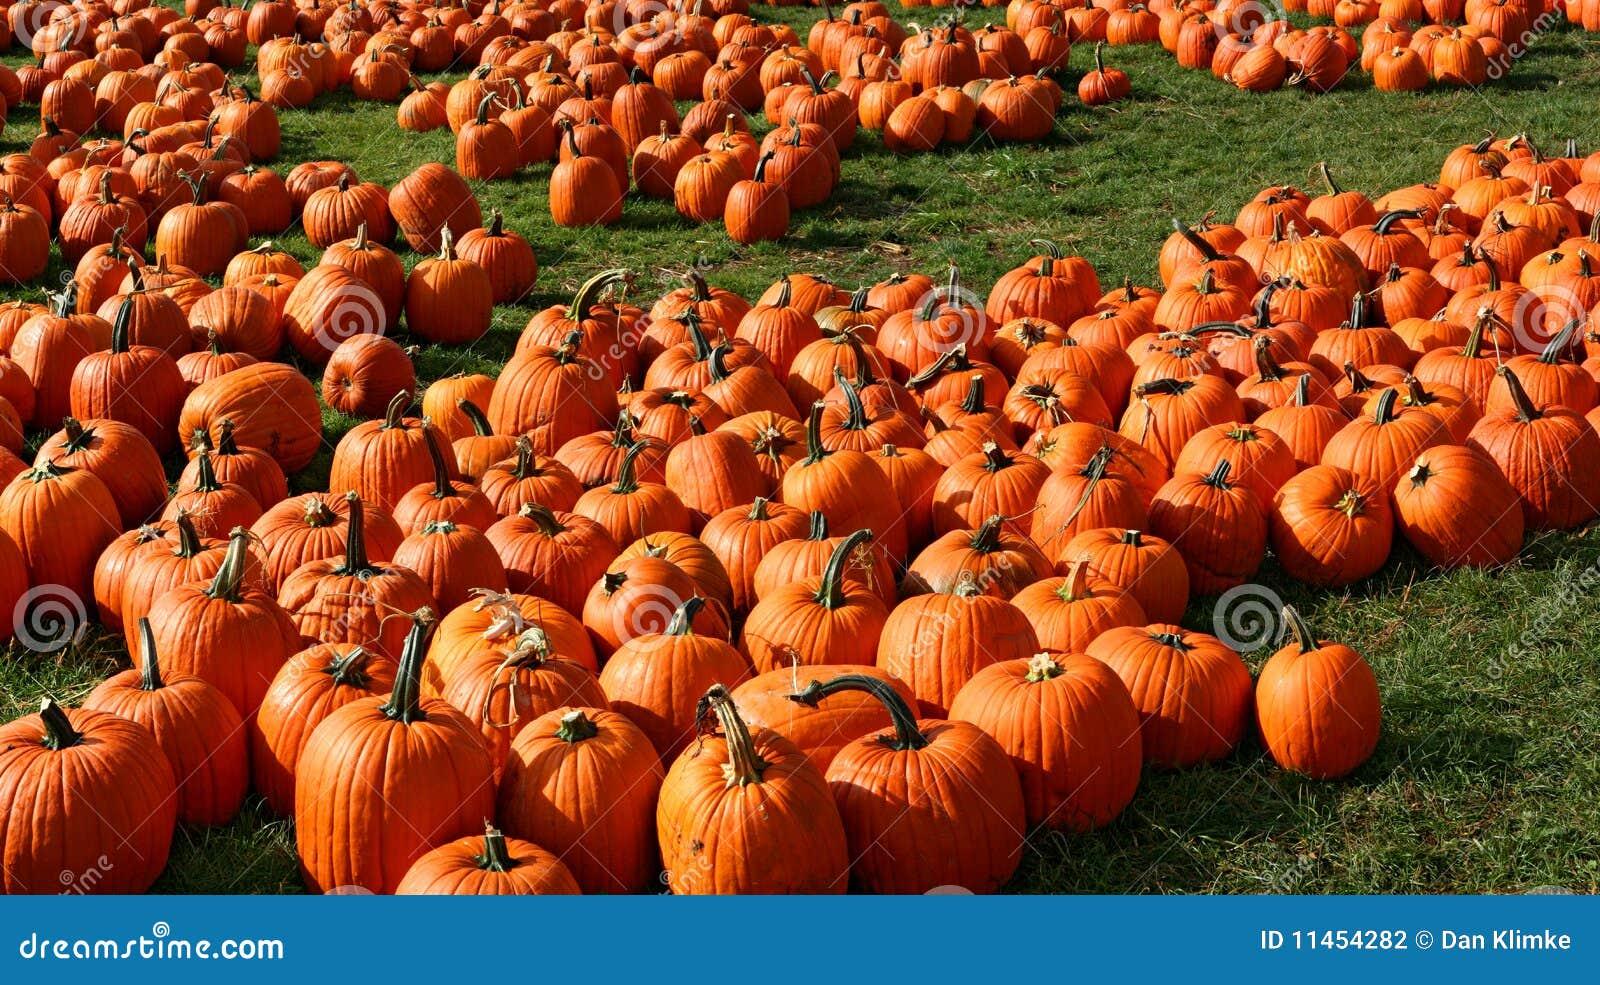 Pumpkin Patch Stock Photo. Image Of Grass, Fruit, Carve